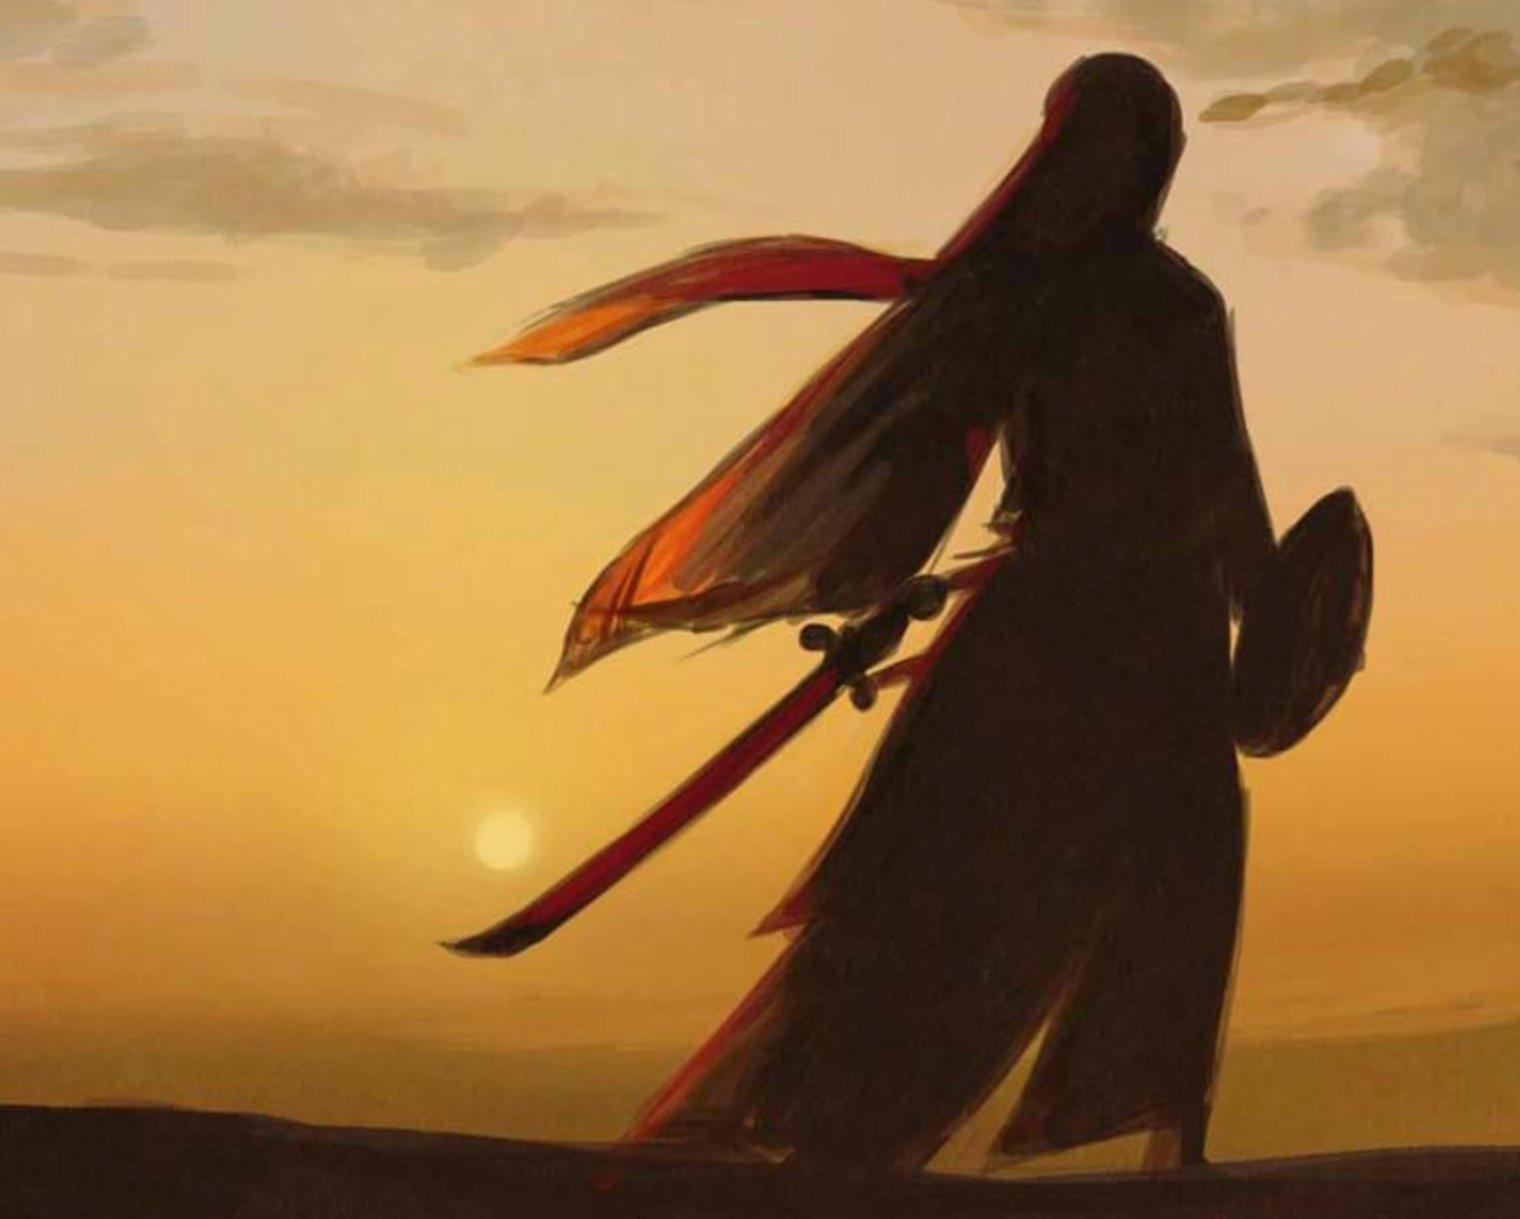 Nusaybah Bint Ka'ab (رضي الله عنها) – The First Woman Warrior of Islam